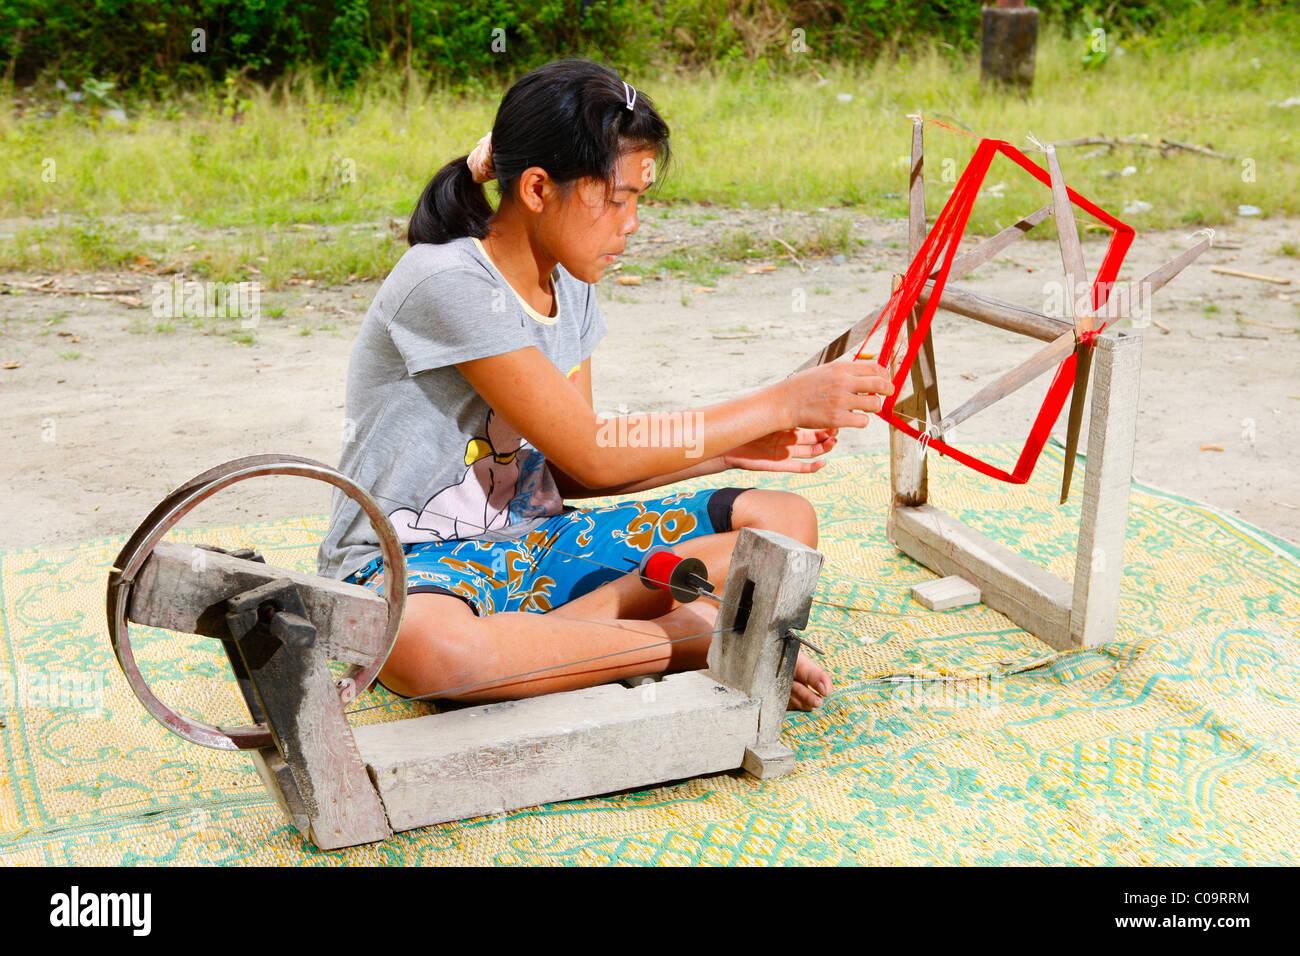 Female spinner, Batak culture, Samosir Island, Lake Toba, Batak region, Sumatra, Indonesia, Southeast Asia, Asia - Stock Image